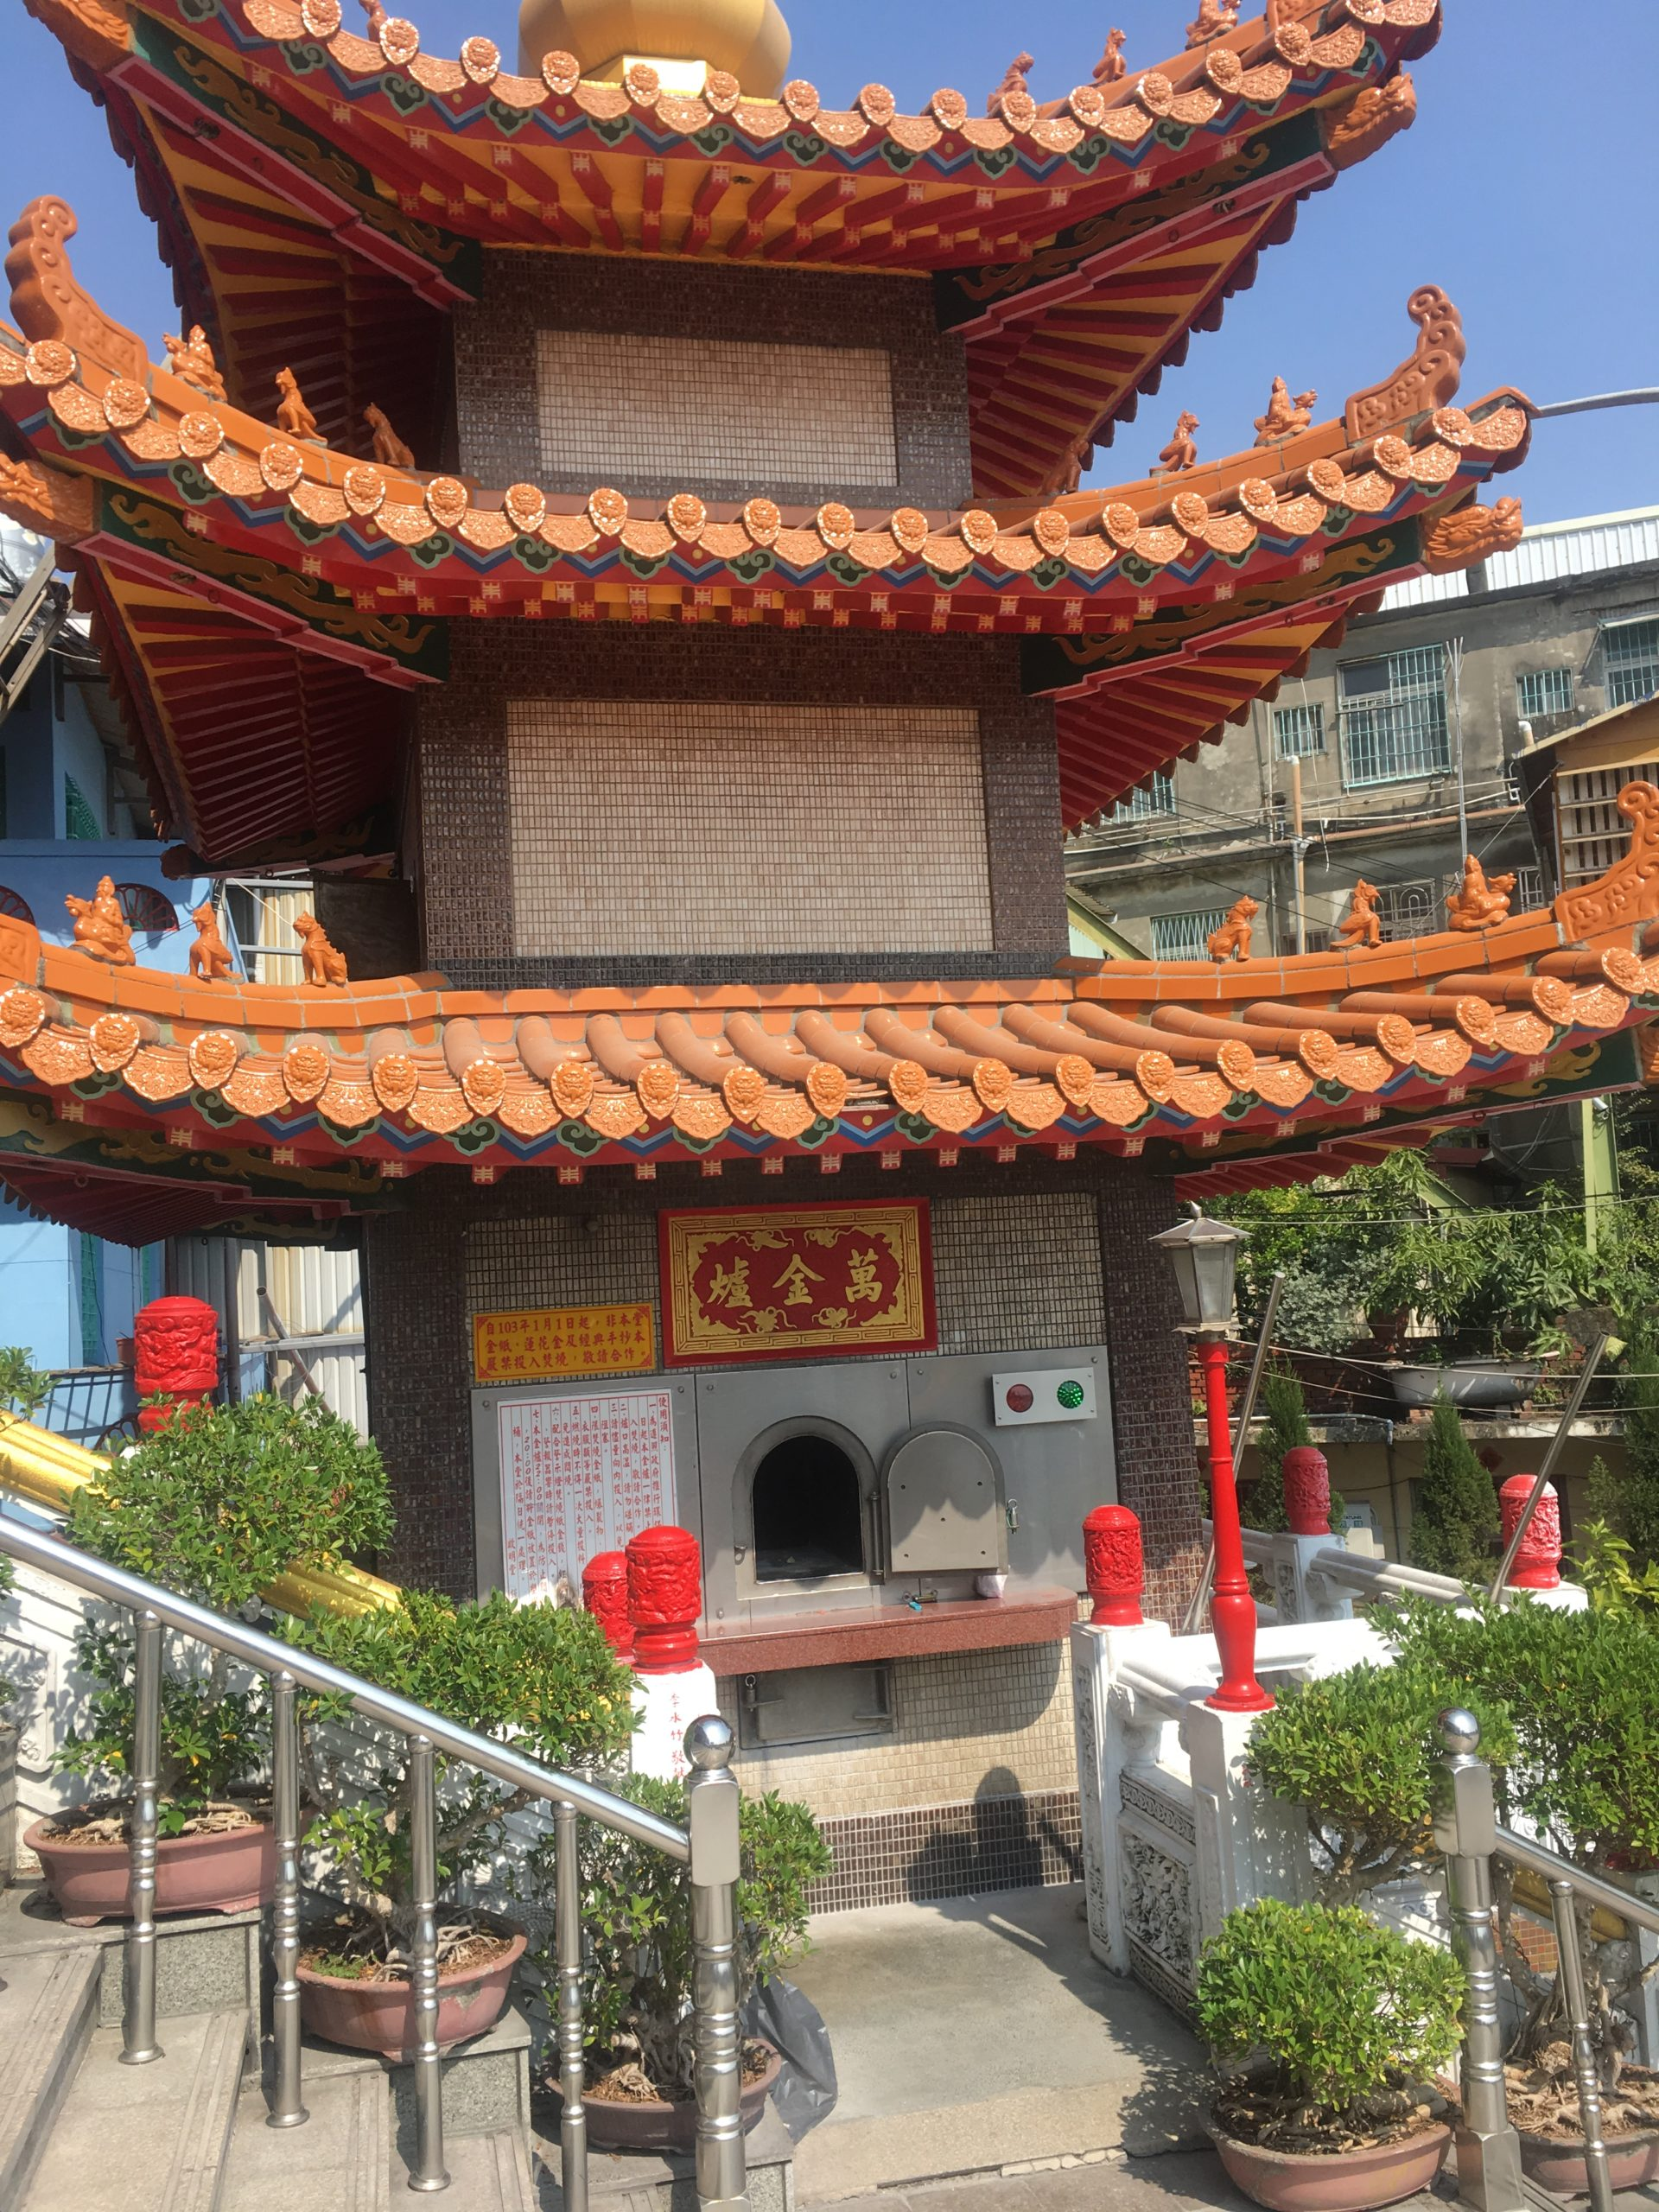 Burner at Chi-Ming-Tang temple at Lotus Ponds